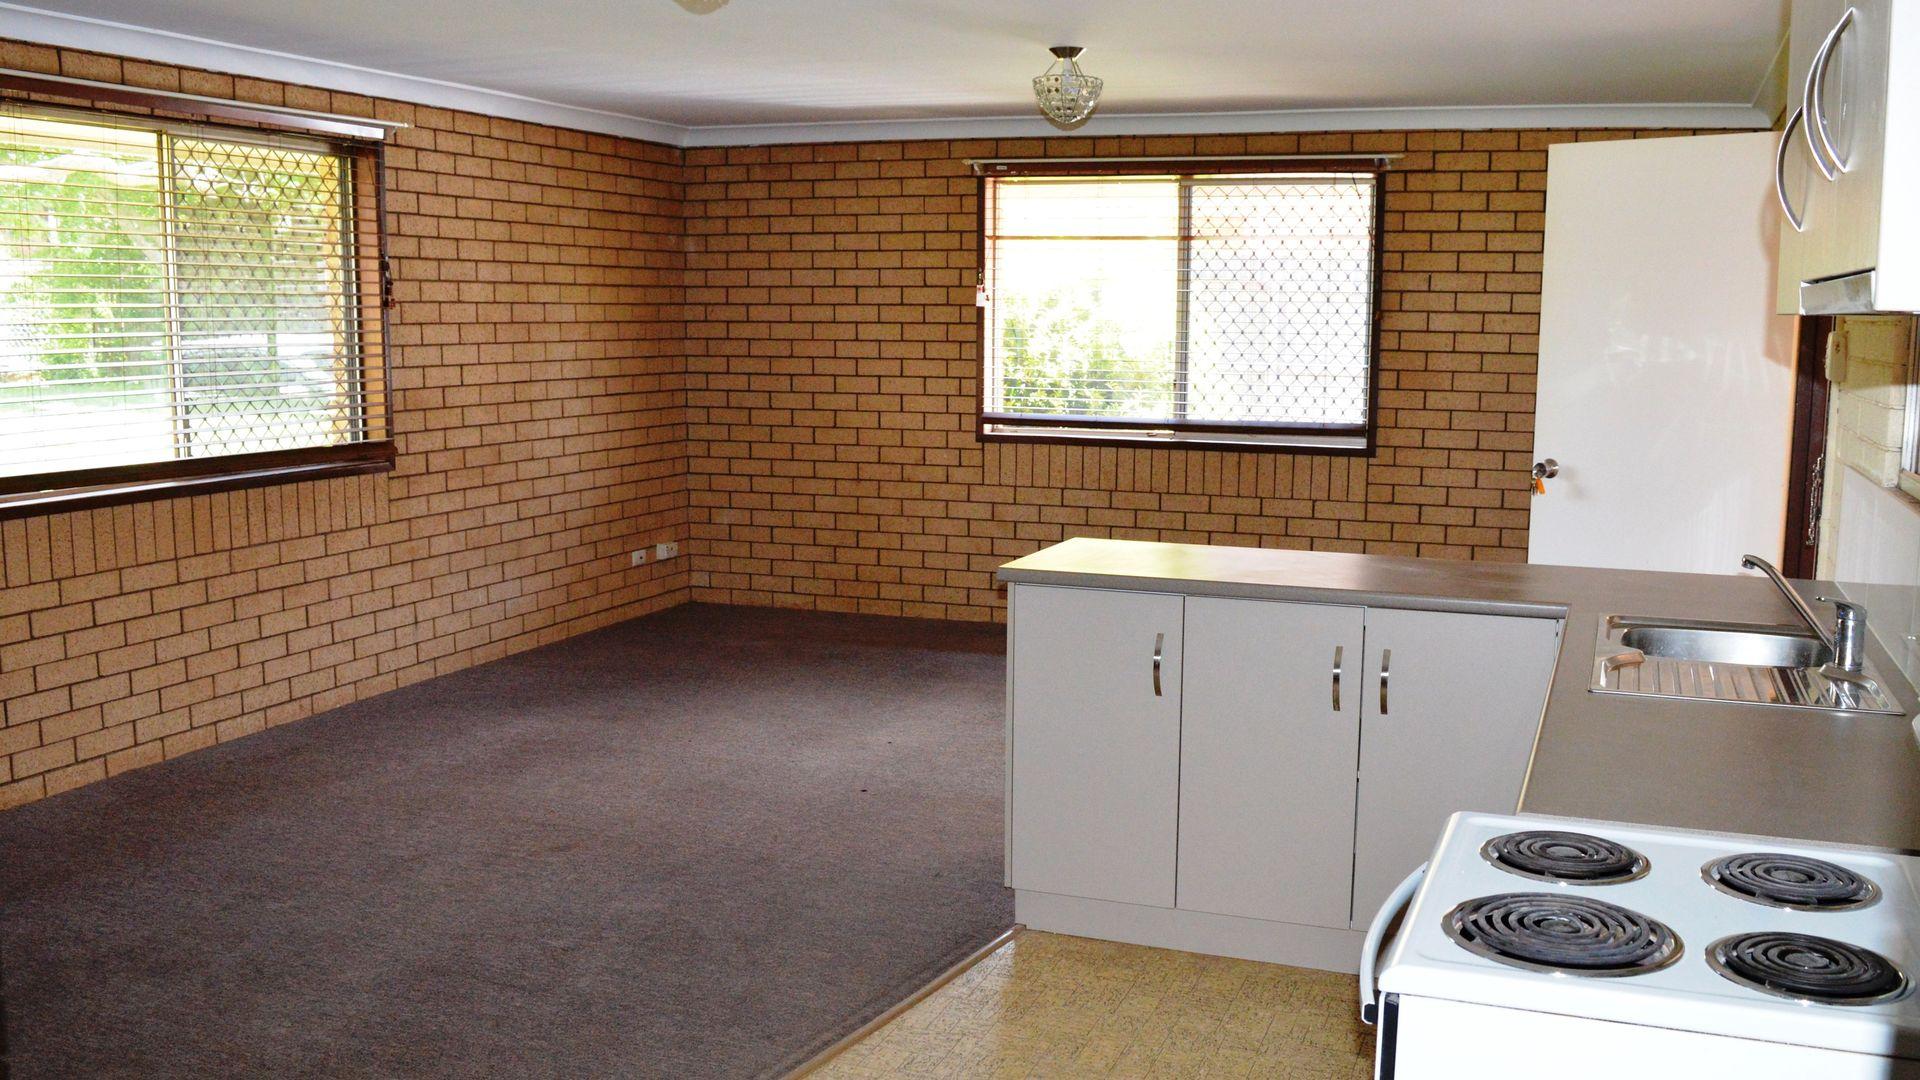 2/353 West Street, Kearneys Spring QLD 4350, Image 1